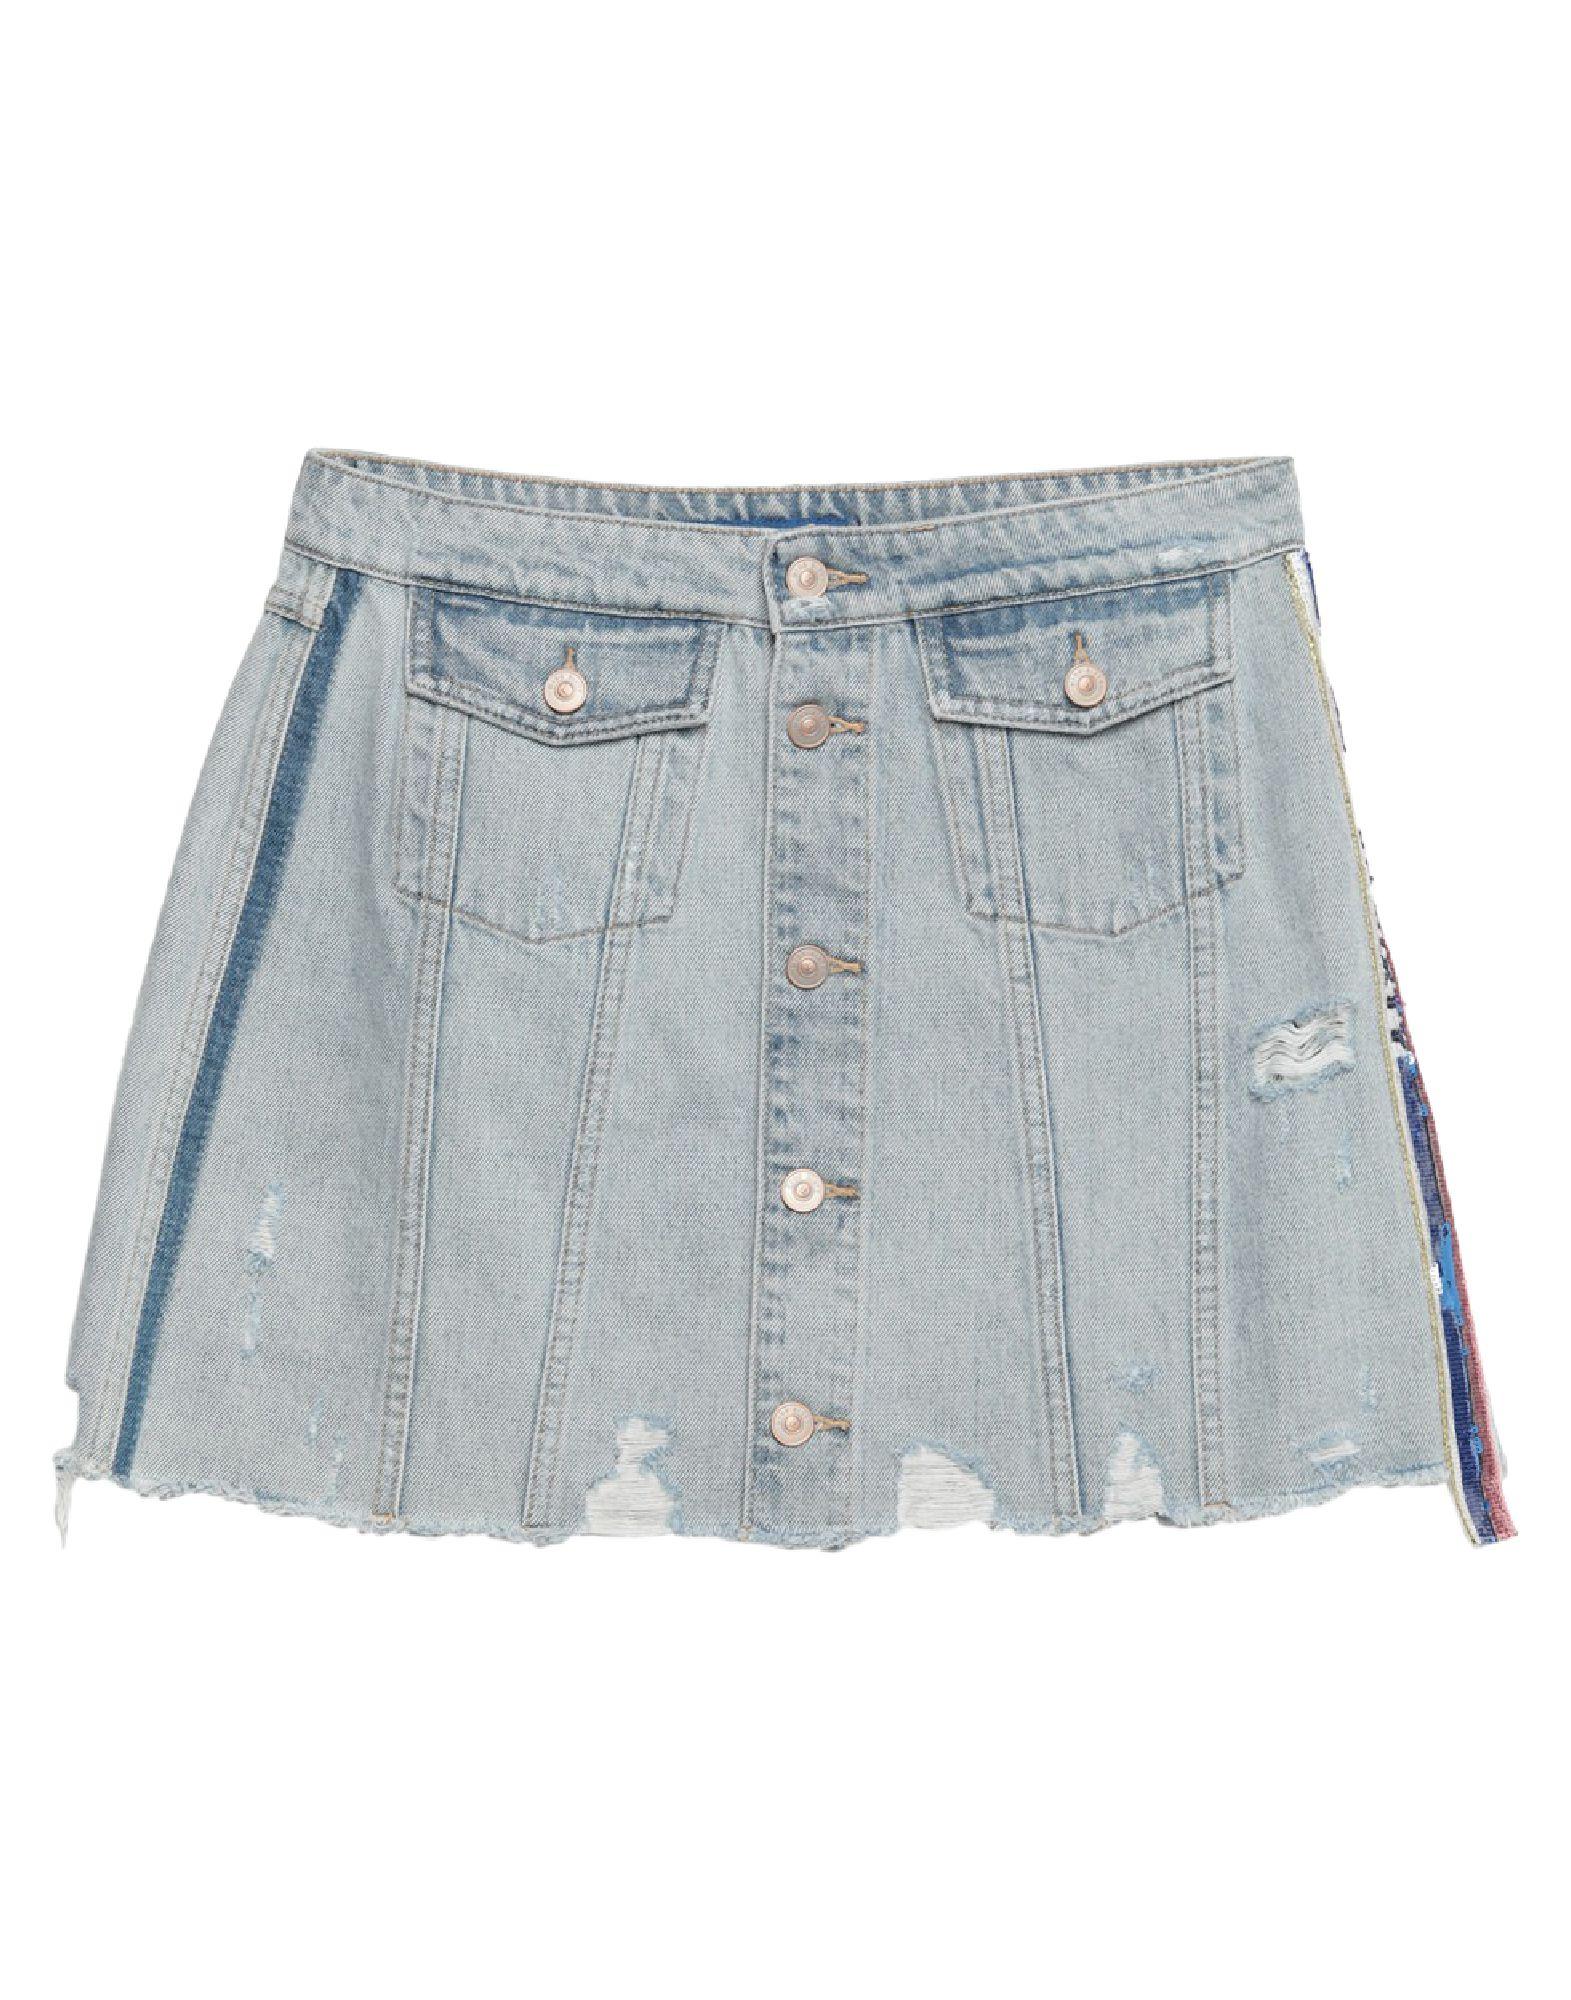 MISS SIXTY Джинсовая юбка ремень miss sixty